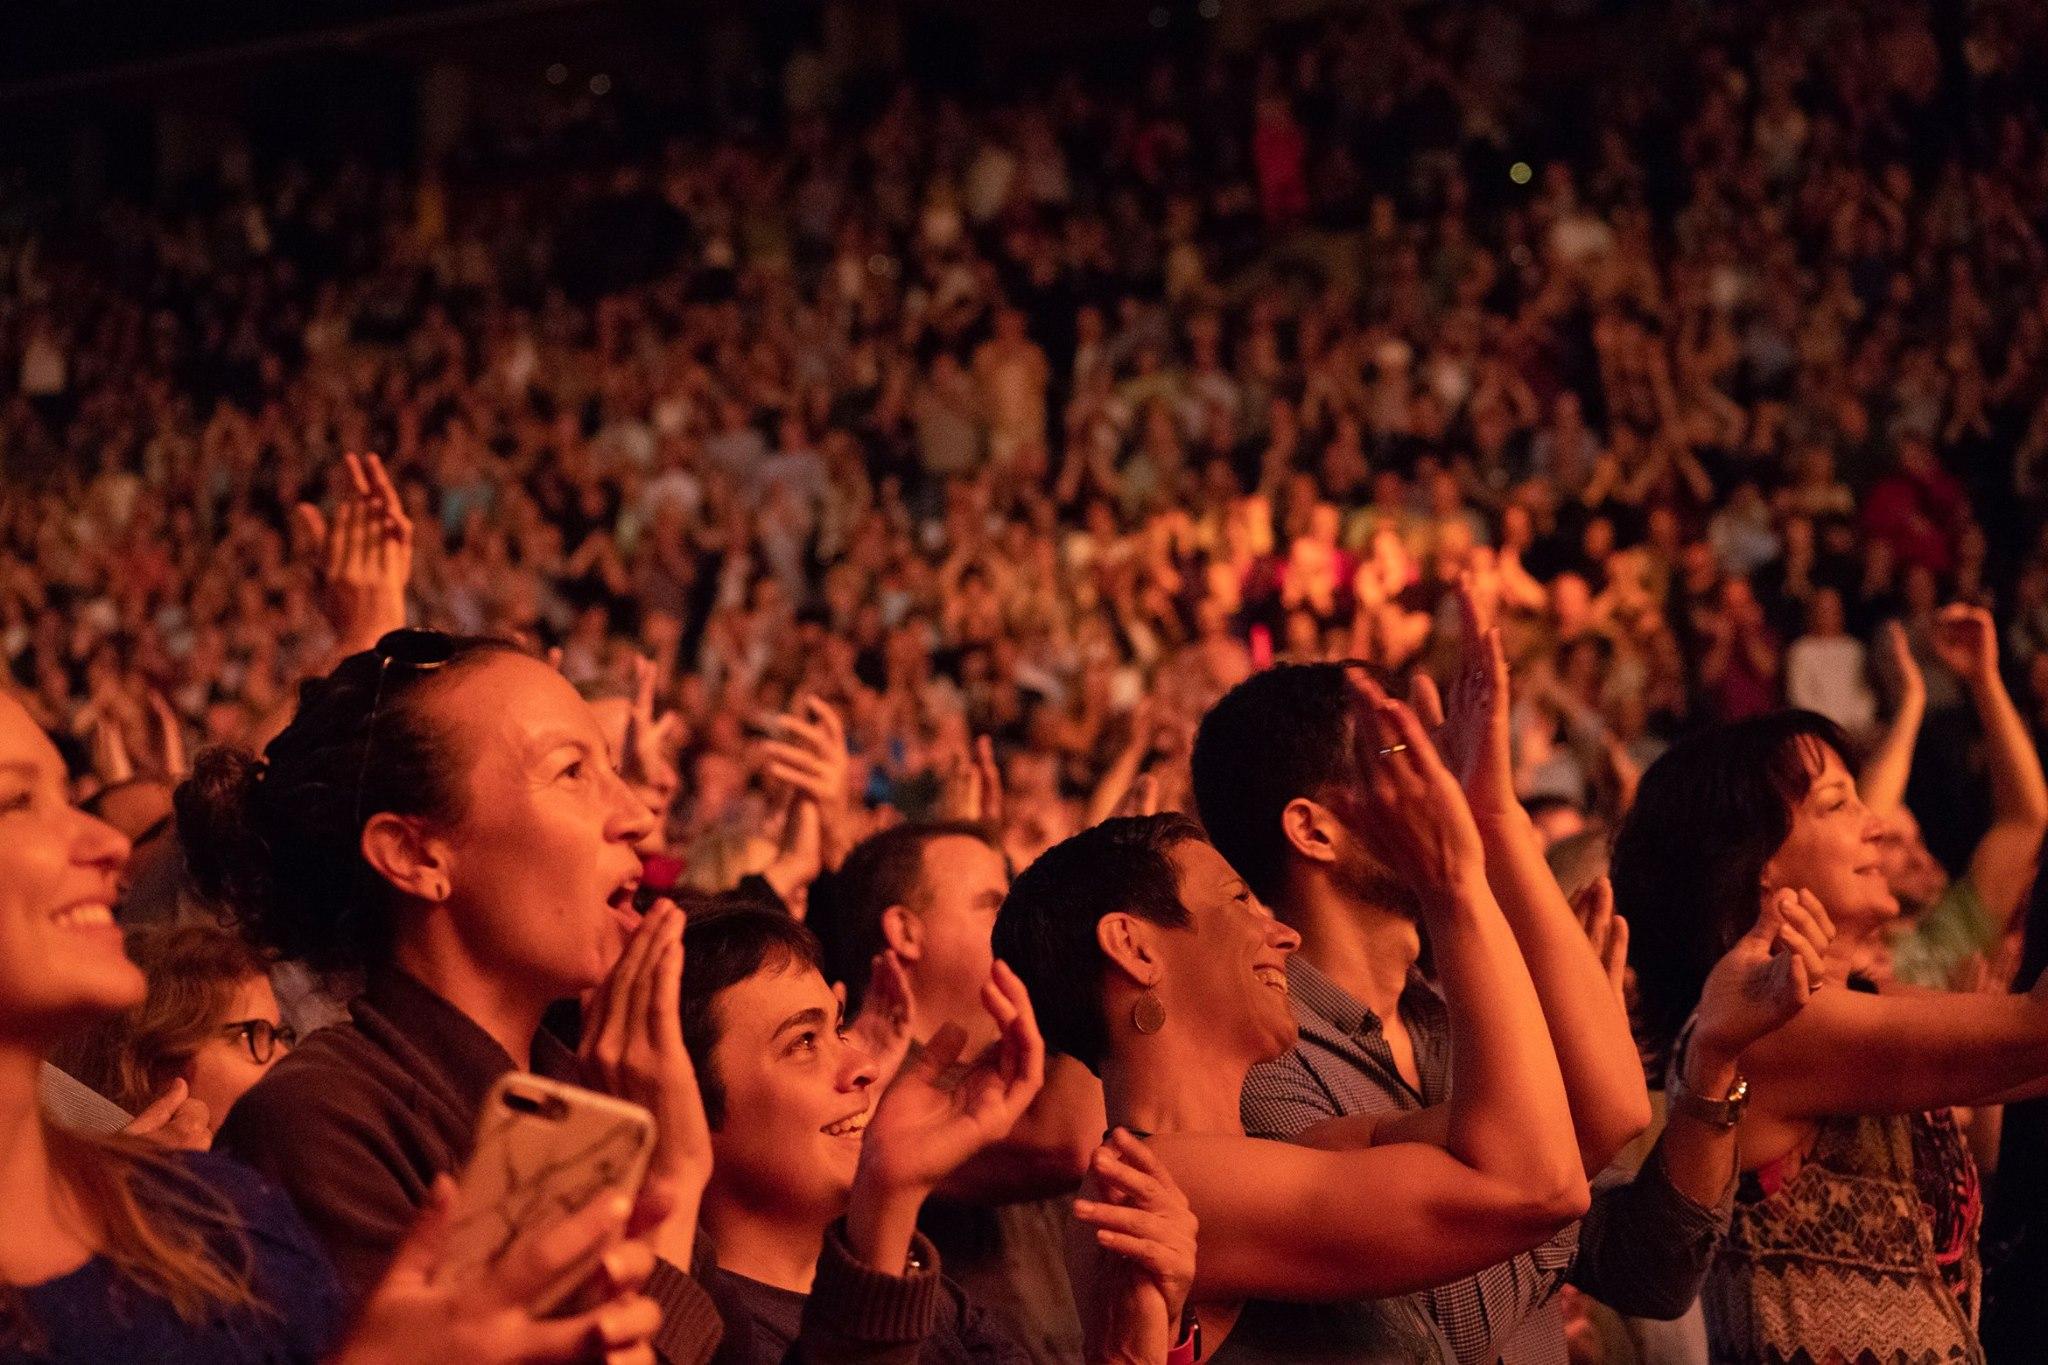 Amazing Crowd In Boston Tonight